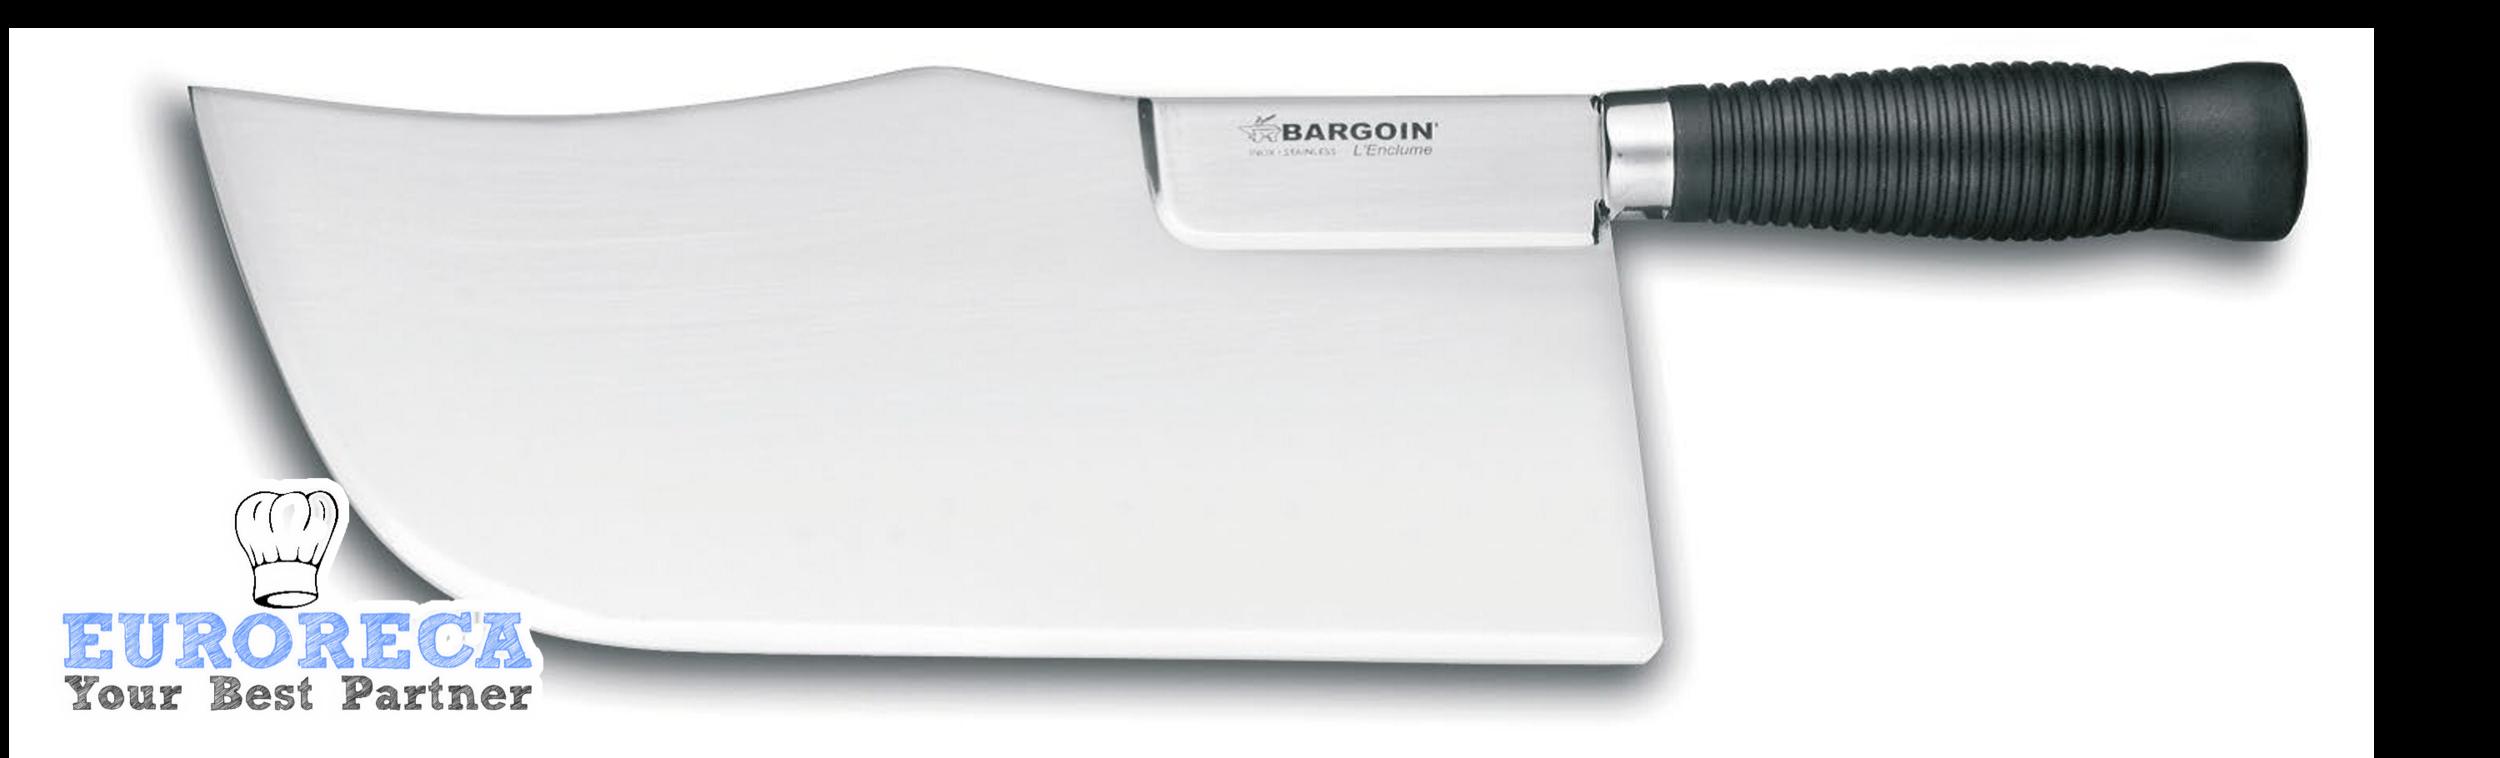 Feuille de boucher renforcée dos cintré 26cm BARGOIN